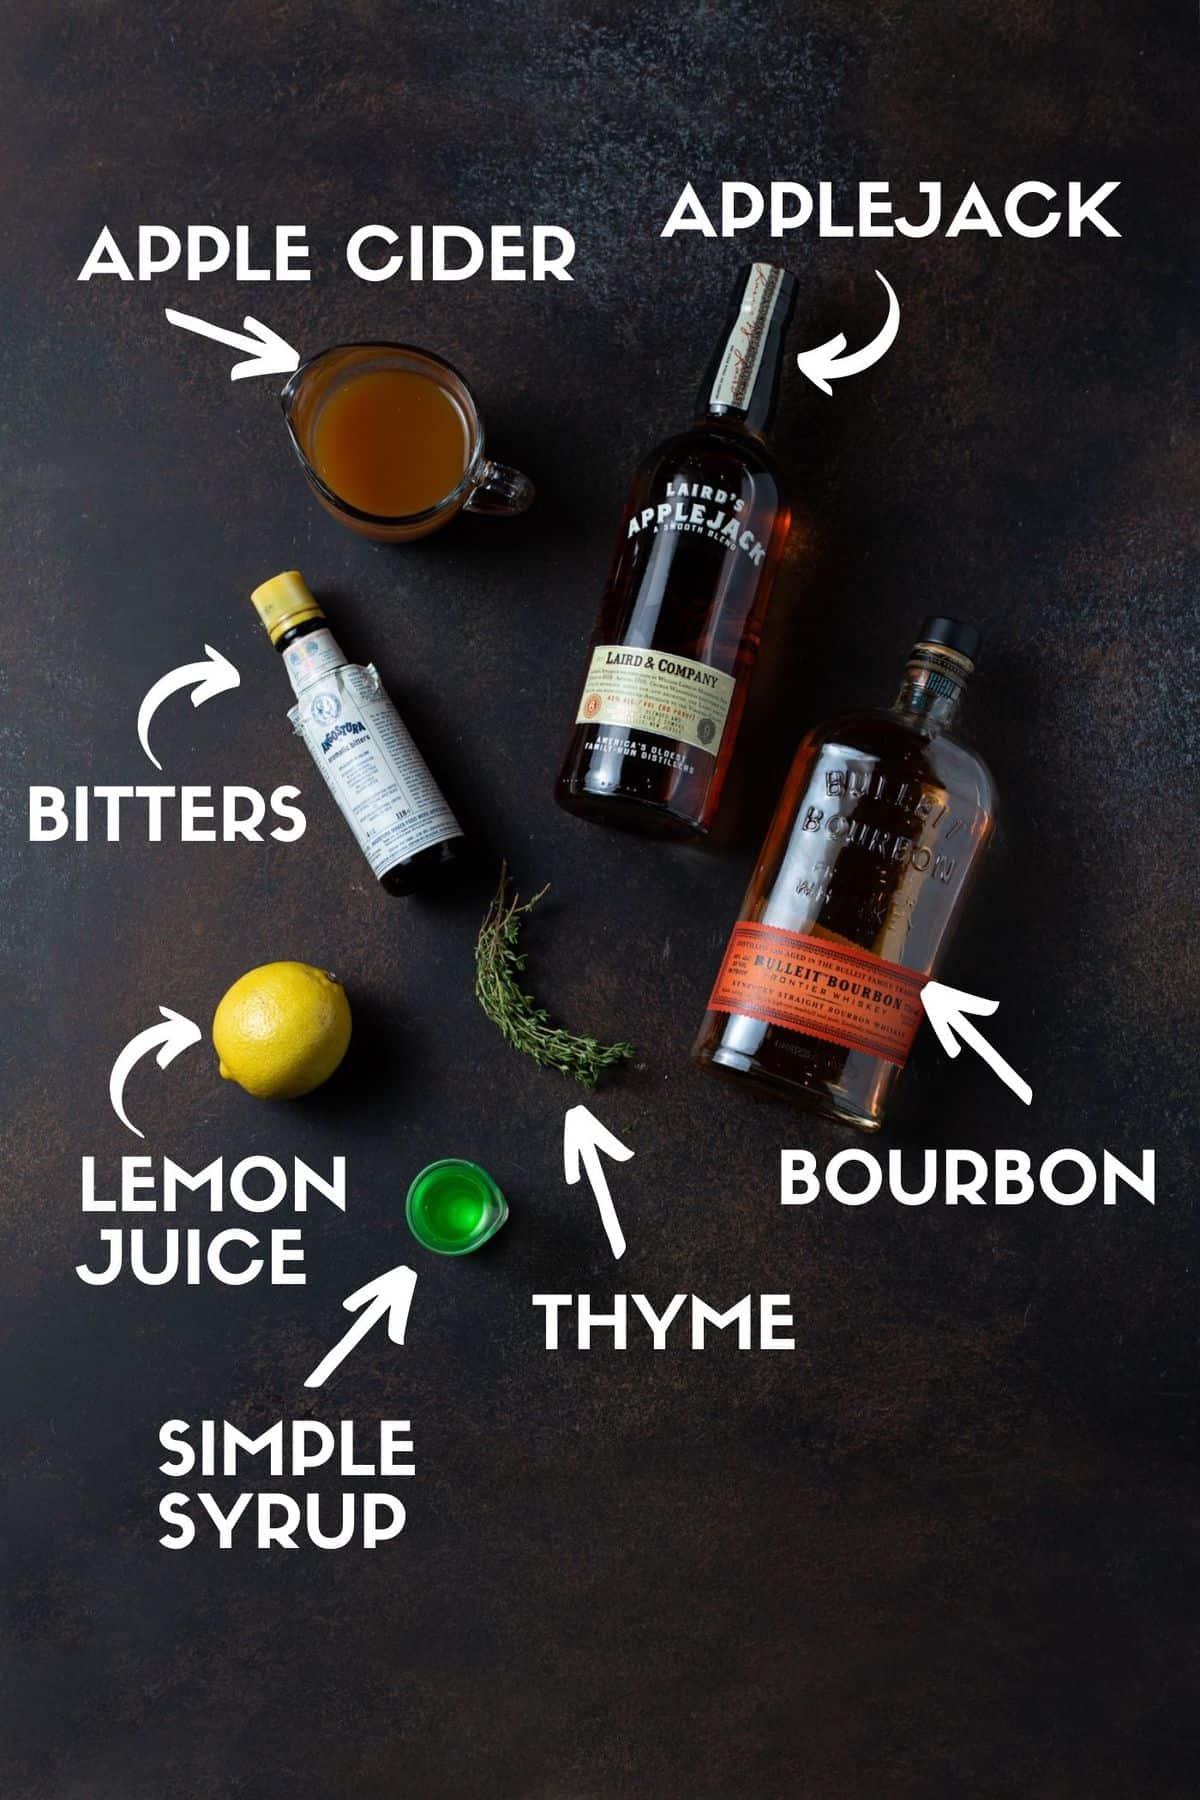 Drink ingredients including bourbon, applejack, apple cider, simple syrup, lemon juice, fresh thyme and bitters.